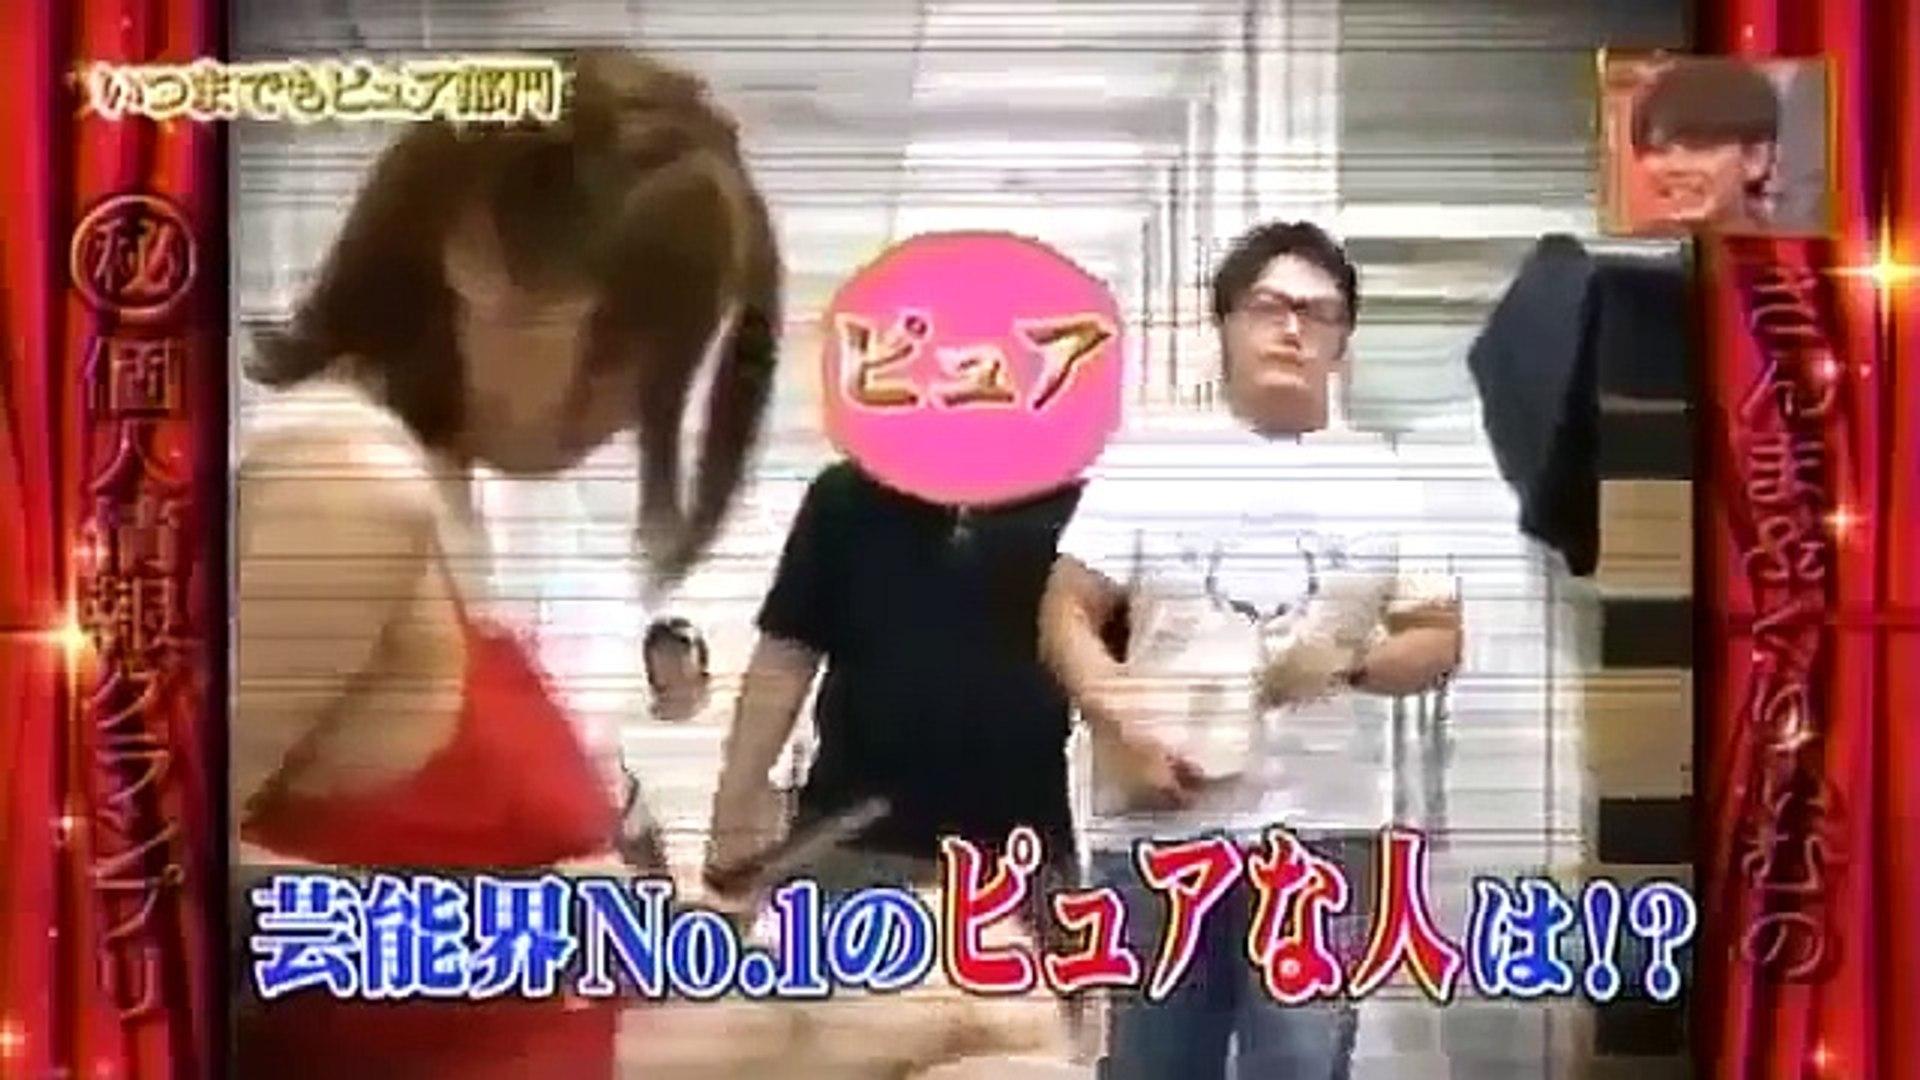 ★TV SHOW★ JAV HD JAPANESE 18+ SEXY PRANK GIRL WITH BIG BOOBS PRANK Japanese sexy gameshows